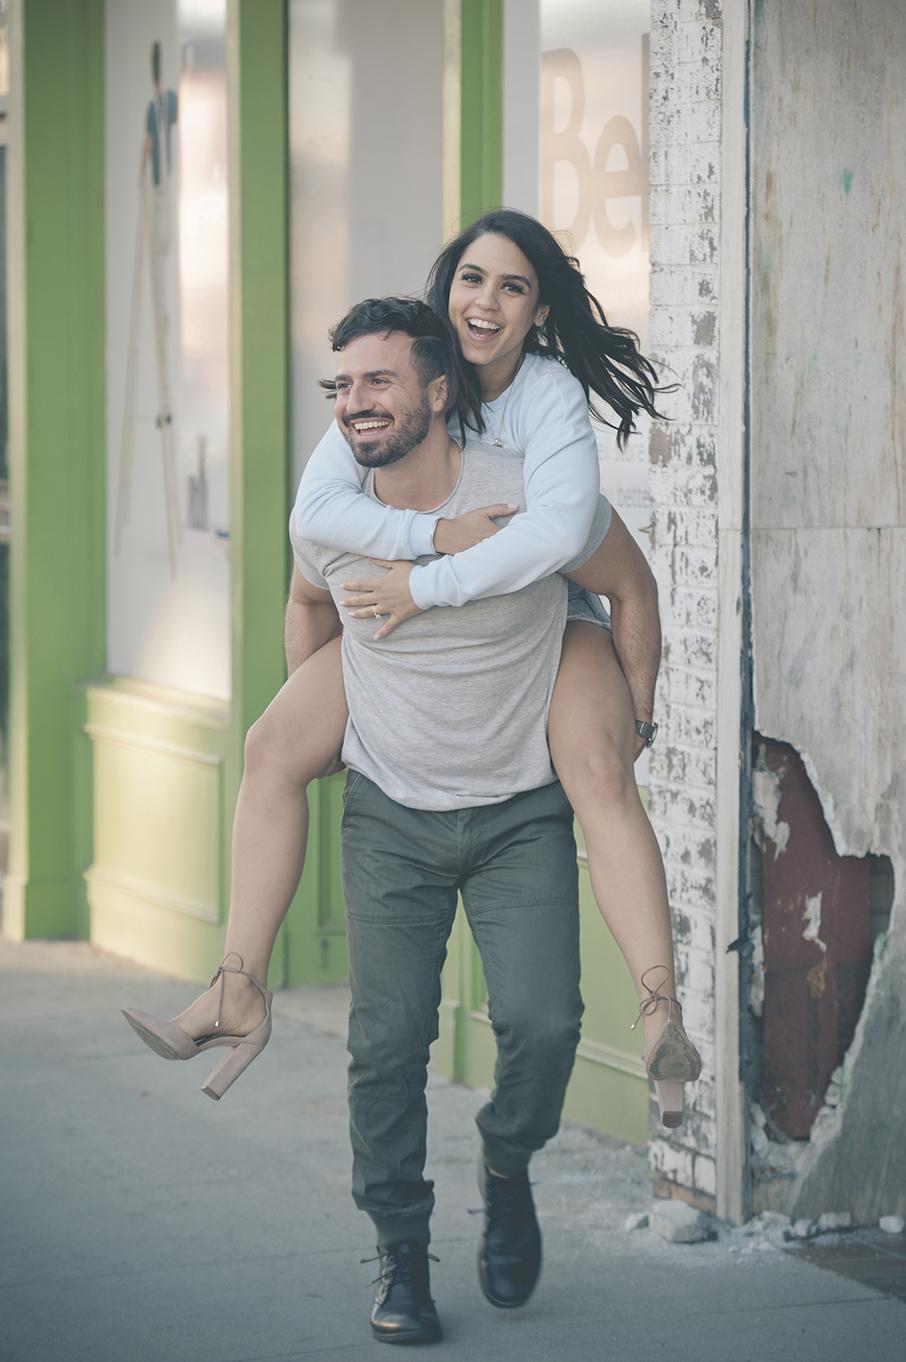 Christina&DanielEngagementSession-172.jpg